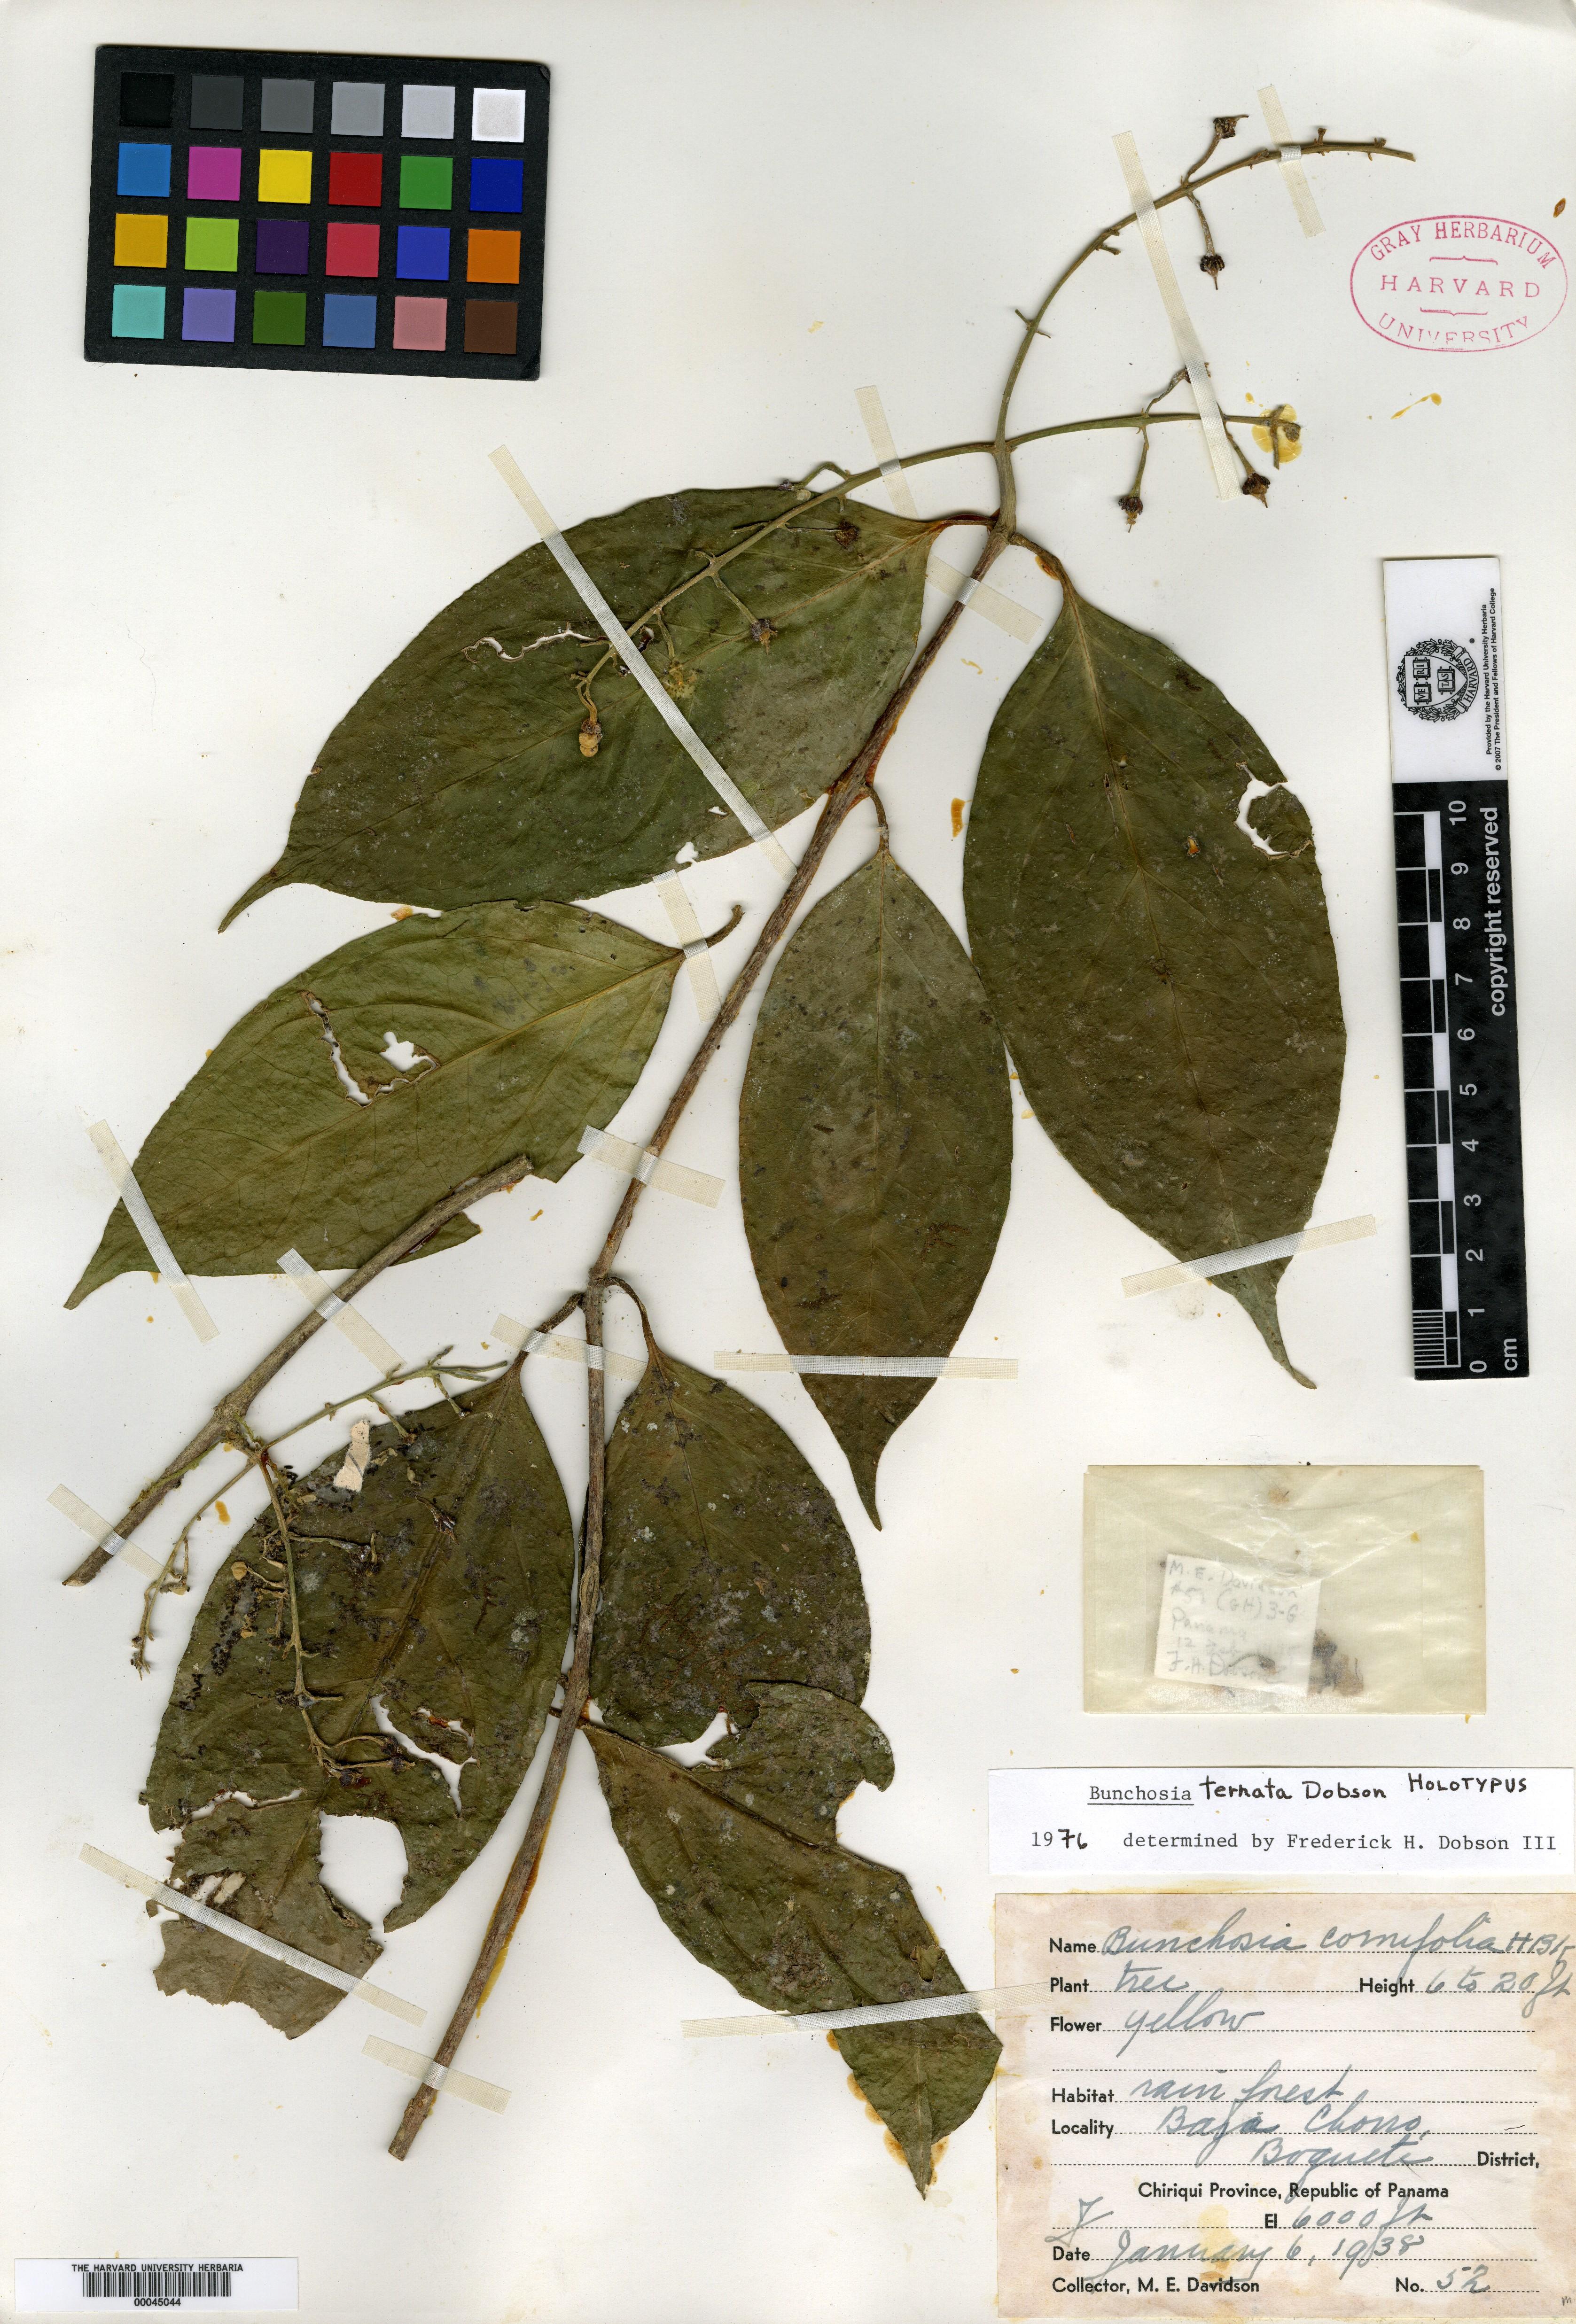 Bunchosia ternata image